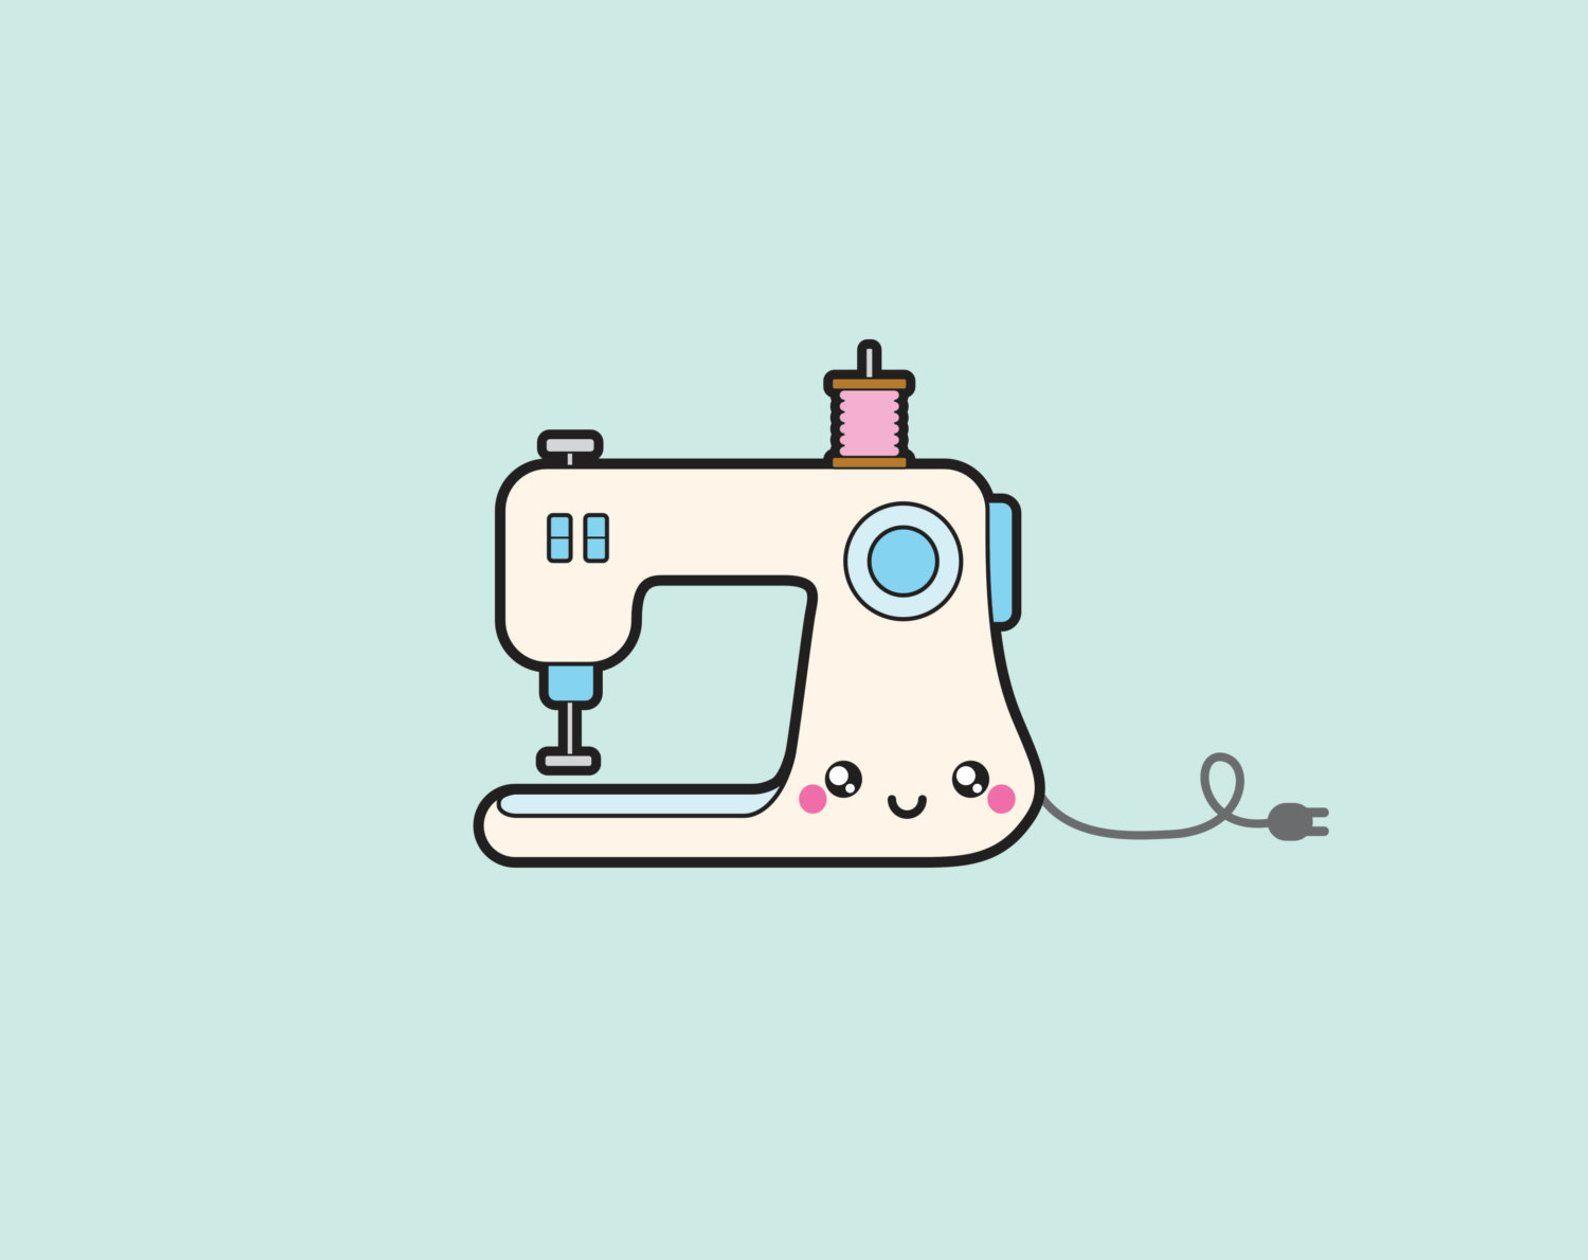 Premium Vector Clipart Kawaii Sewing Clipart Kawaii Sewing Clip Art Set High Quality Vectors Instant Download Kawaii Sew Clipart Sewing Clipart Clip Art Kawaii Clipart